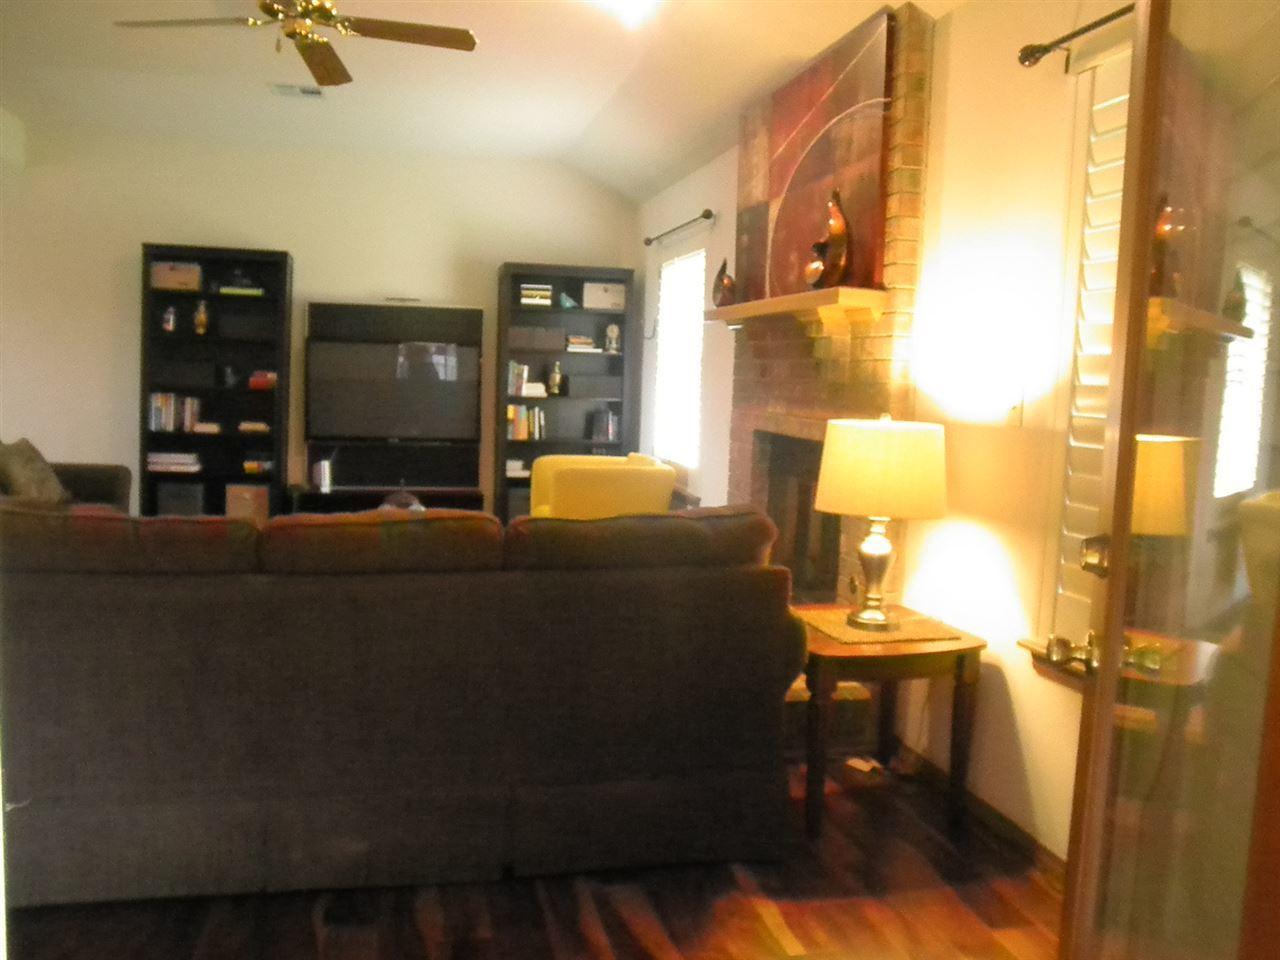 Sold Intraoffice W/MLS | 400 Lonnie Ponca City, OK 74601 7